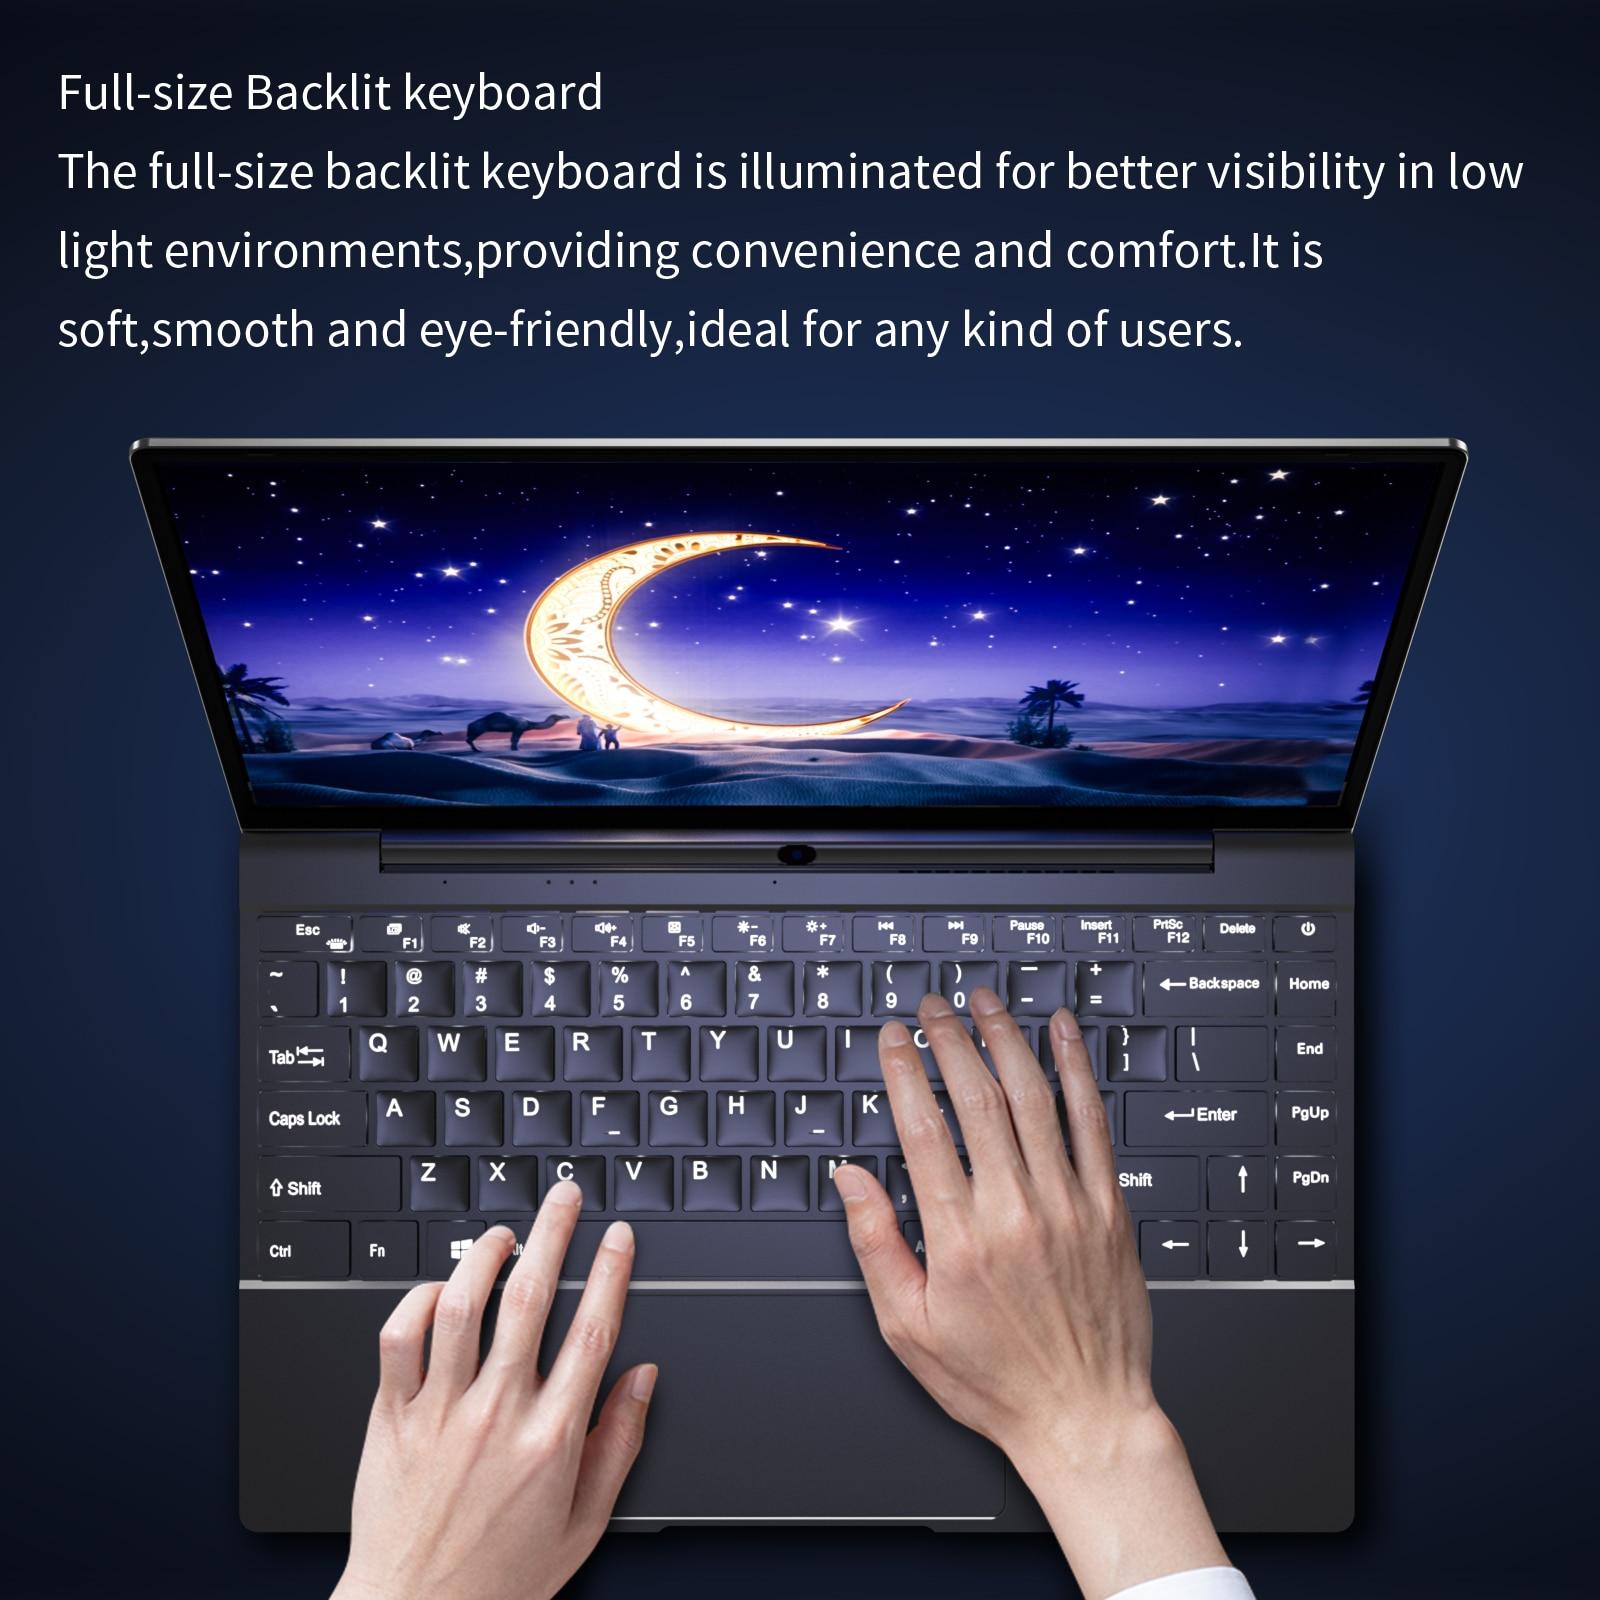 N5095 2021 New CPU 14 Inch Laptop 12G RAM Windows 10 Pro Quad Core Netbook Backlit Keyboard Mini PC 1920*1080 IPS Mini Notebook